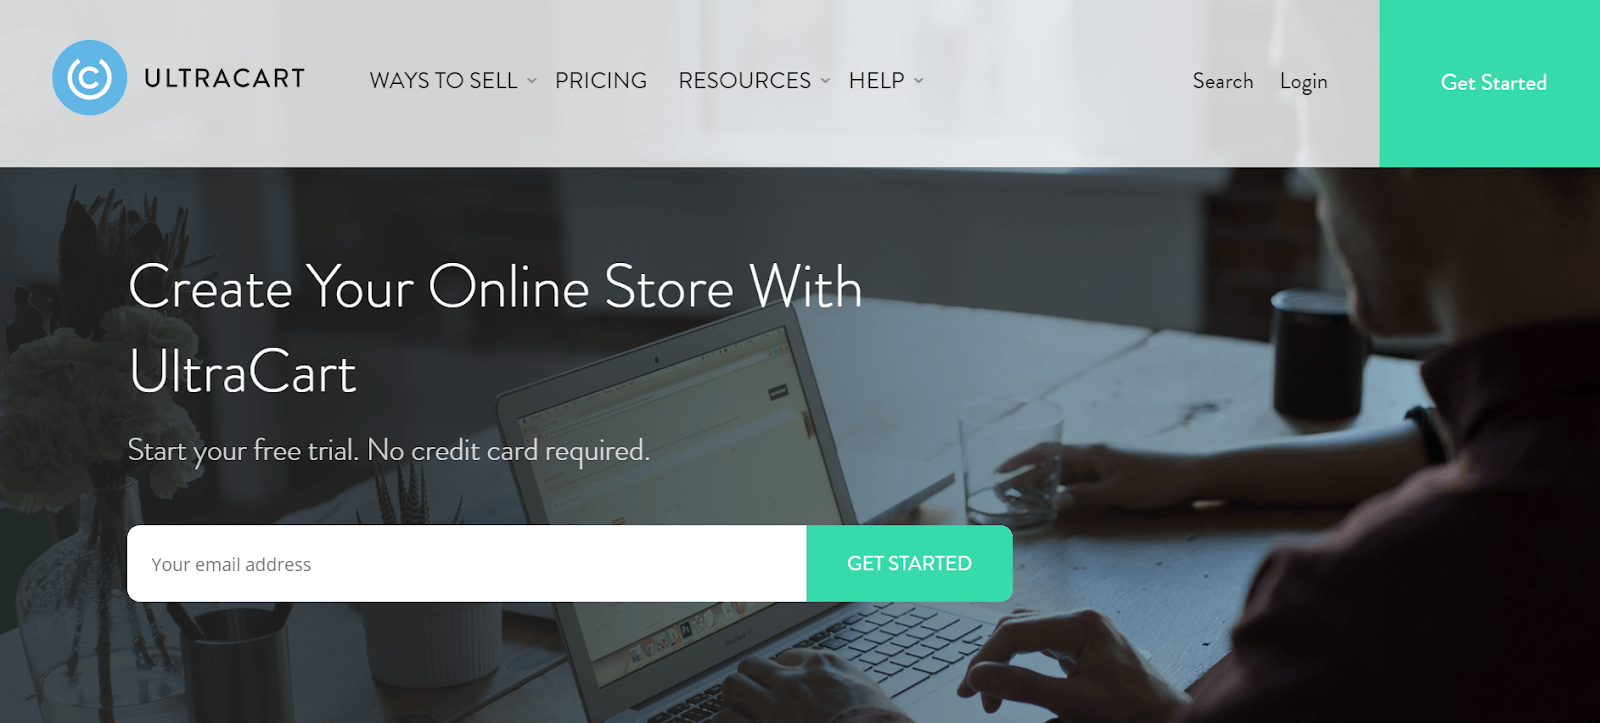 UltraCart Ecommerce Platforms